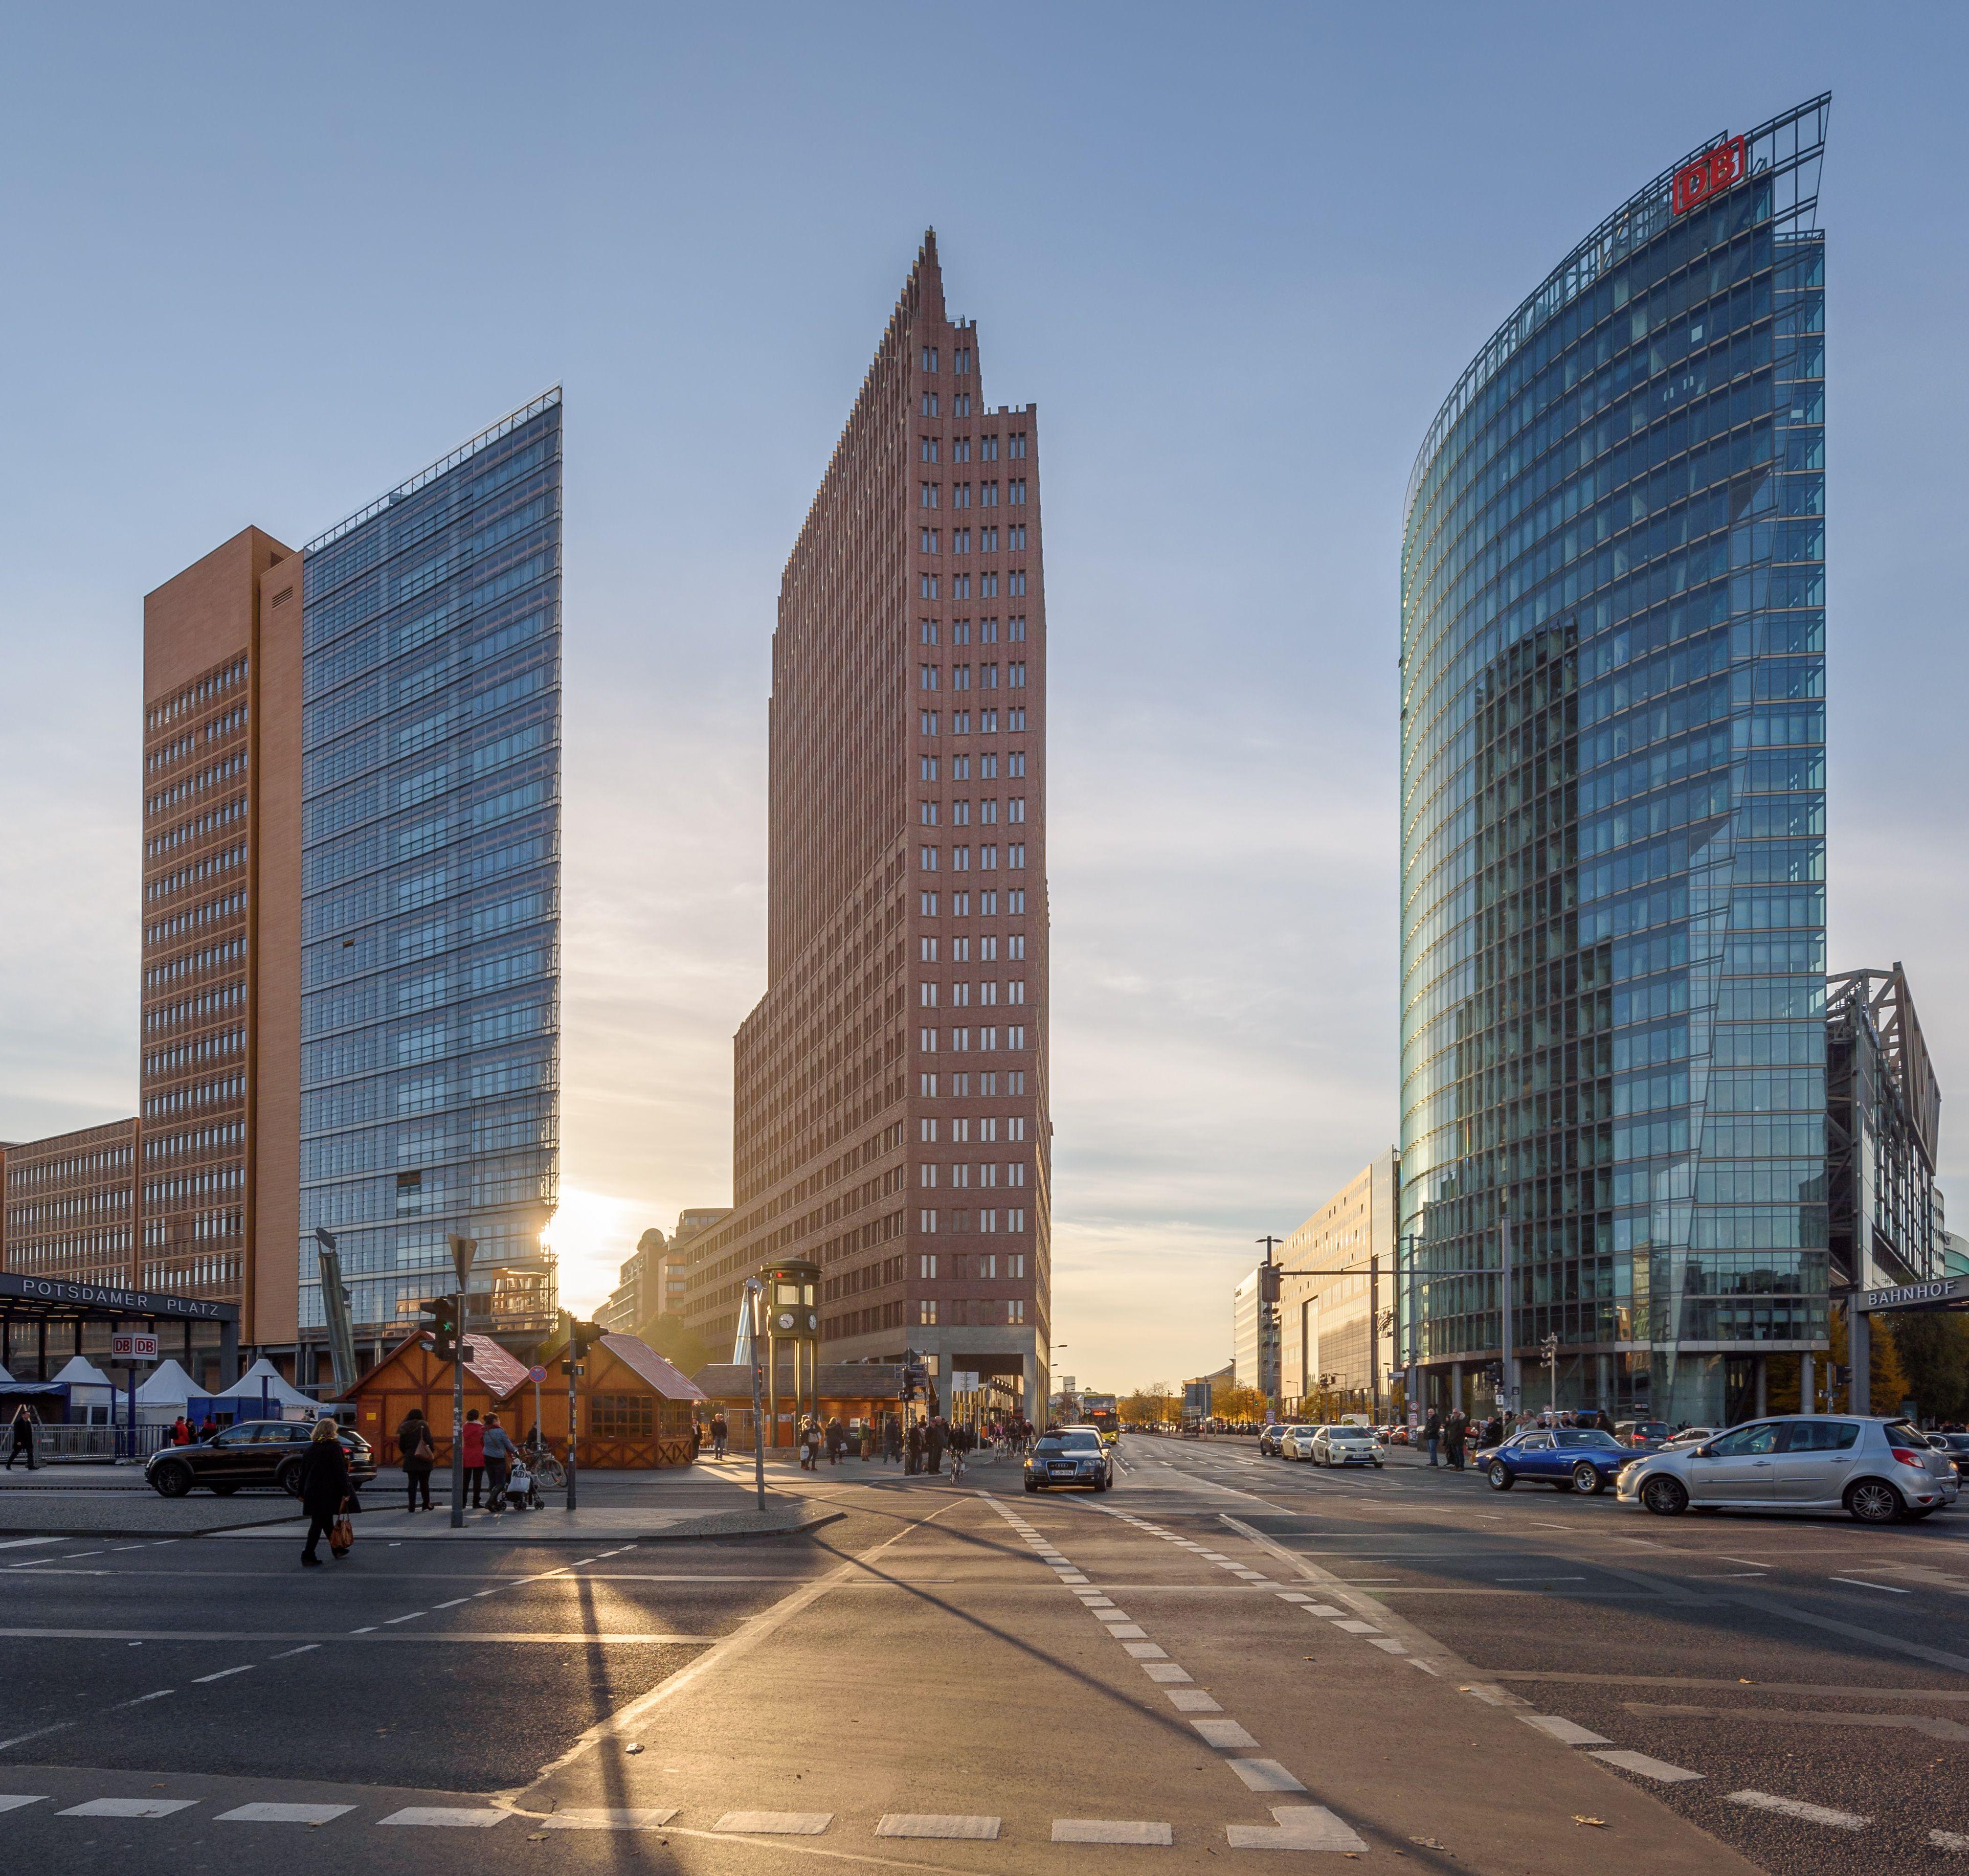 The Architecture Of Reunification At Potsdamer Platz And Kulturforum Potsdamer Platz Architecture Skyscraper